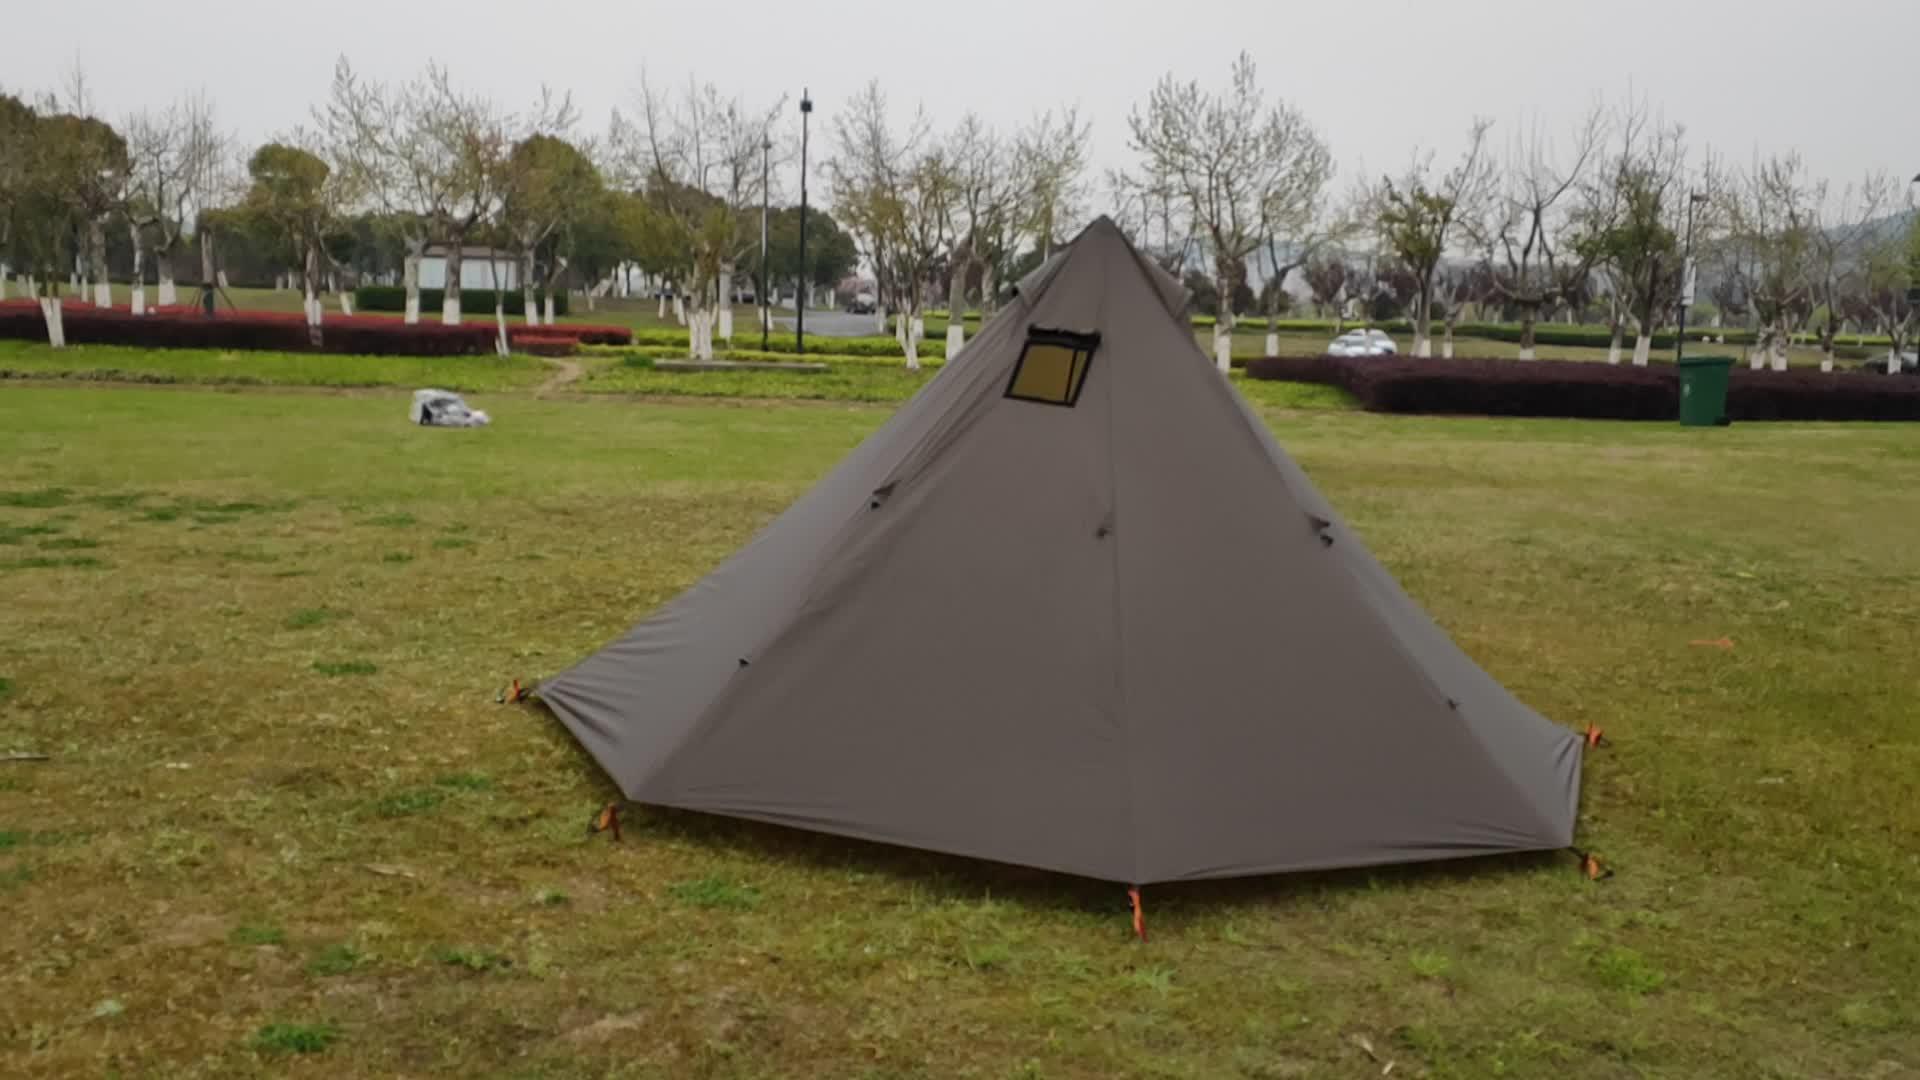 Fabriek Goedkope Hoge Kwaliteit Ultralight Outdoor Verwarmd 2 Persoon Piramide Polyester Tent